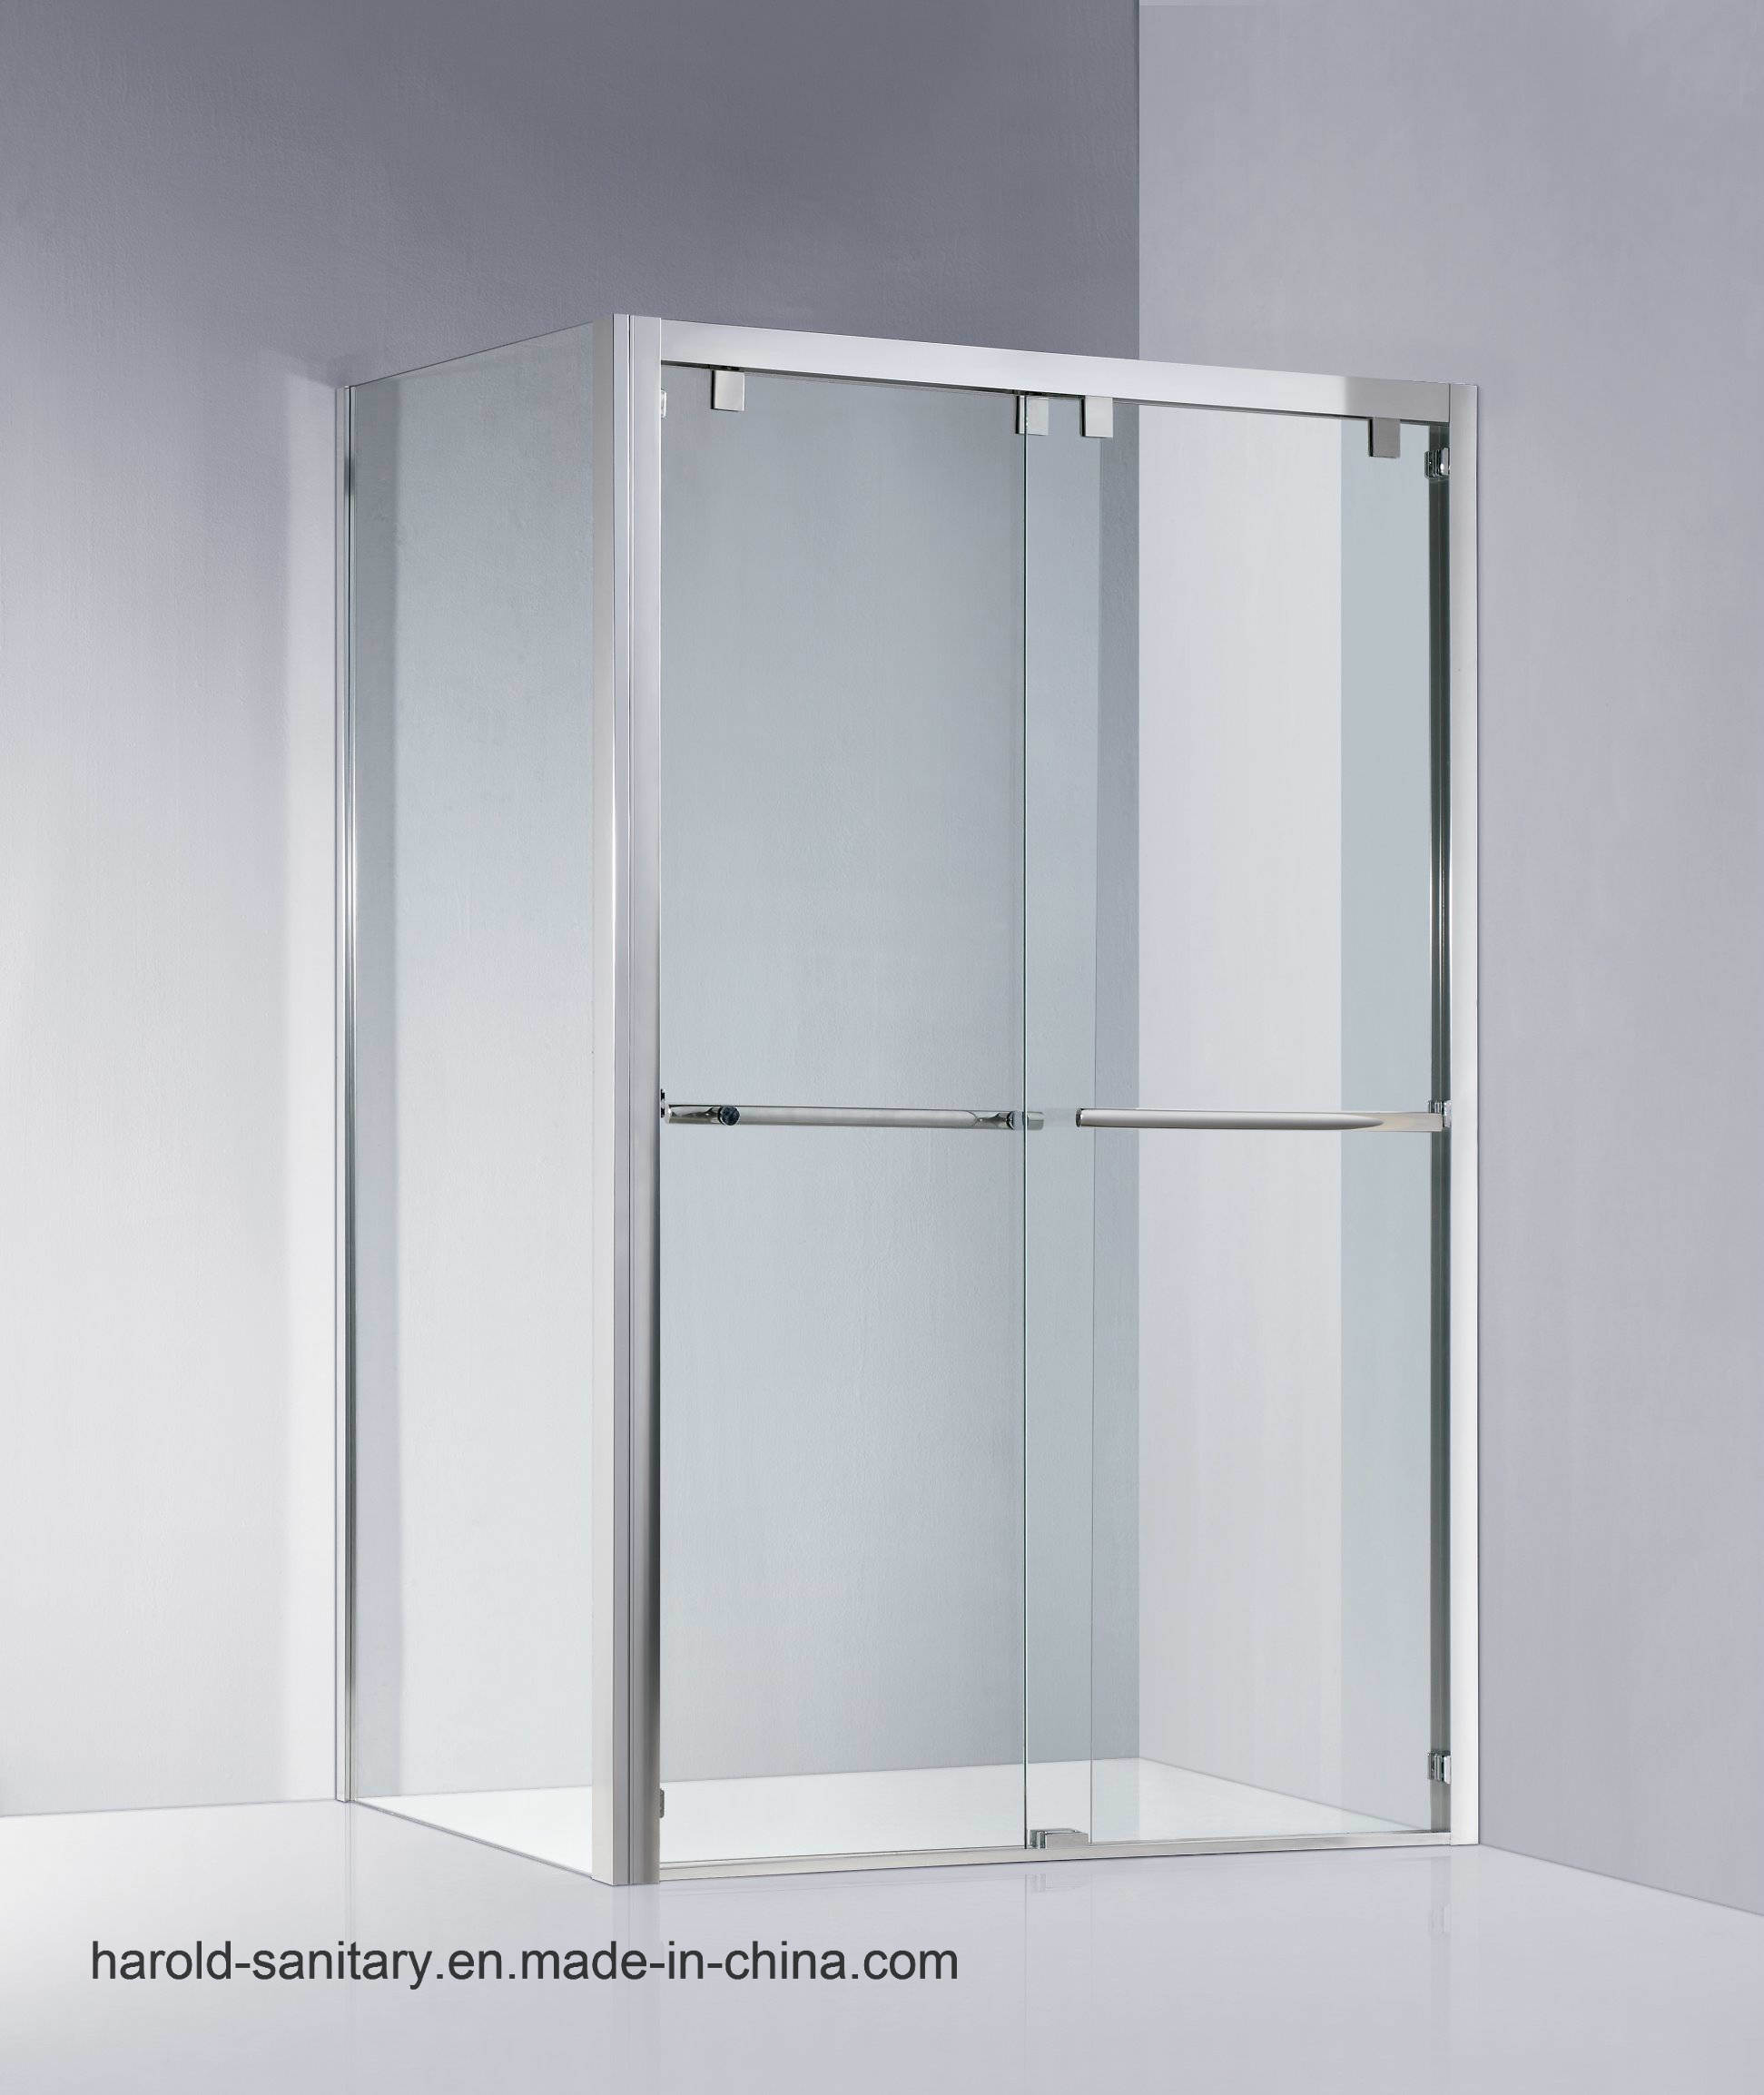 China Bypass Shower Screen Bathtub Screen Double Sliding Door System